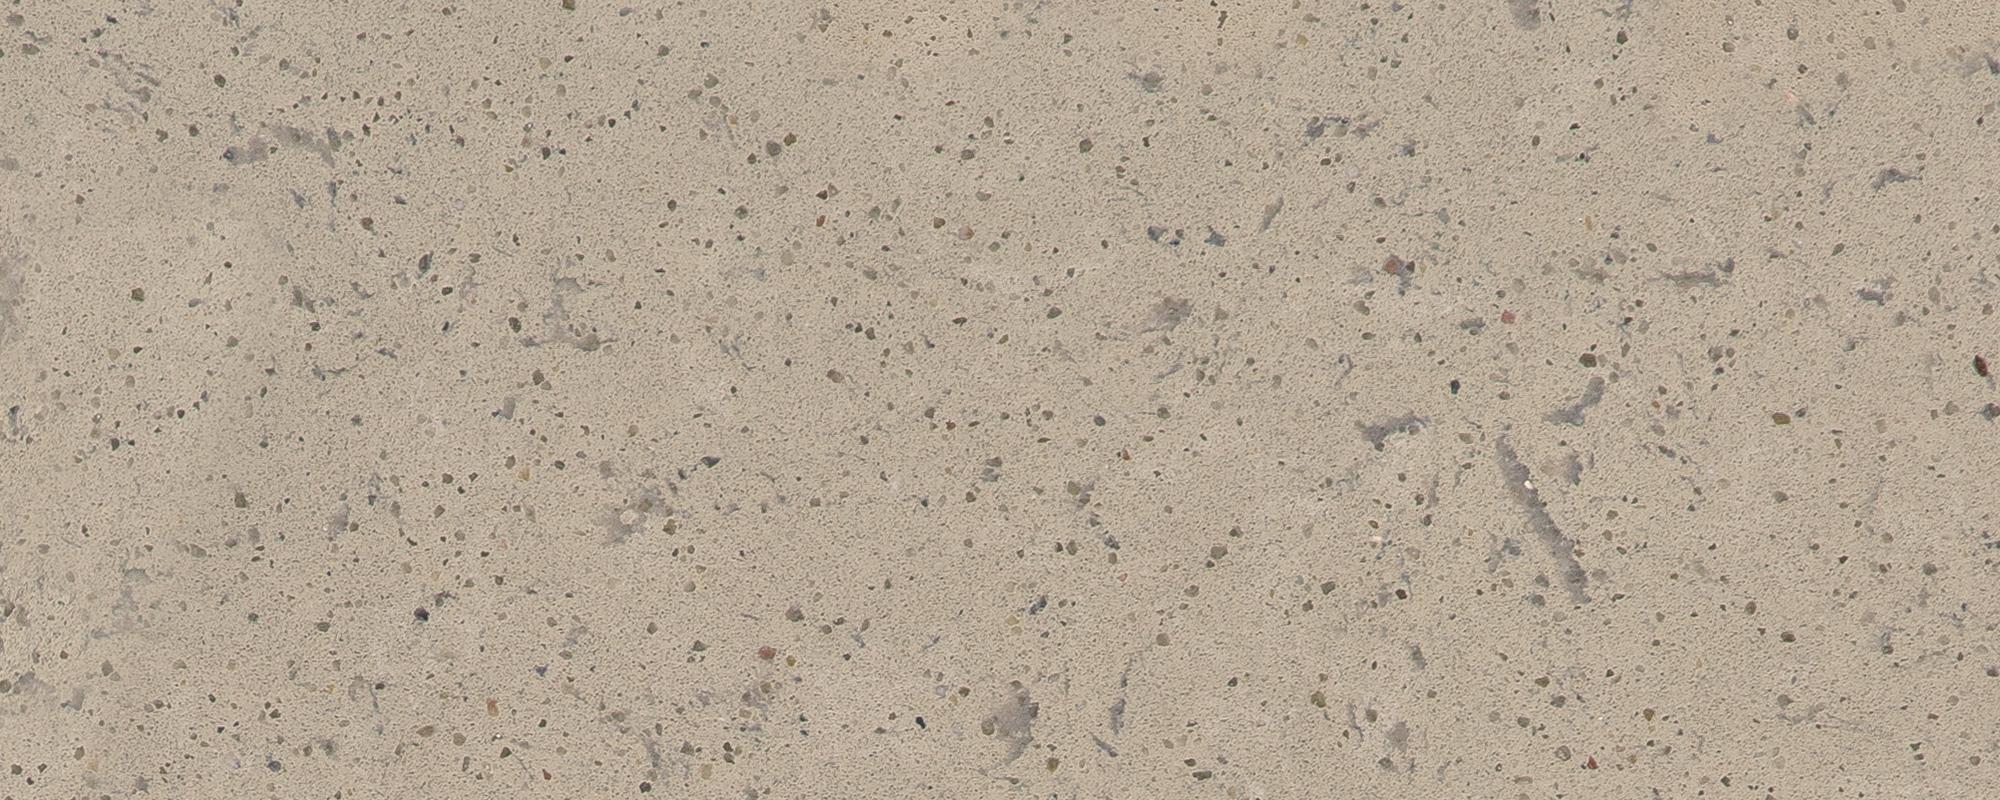 Cuarzo De Color Beige Concrete Colecci 243 N New York Compac